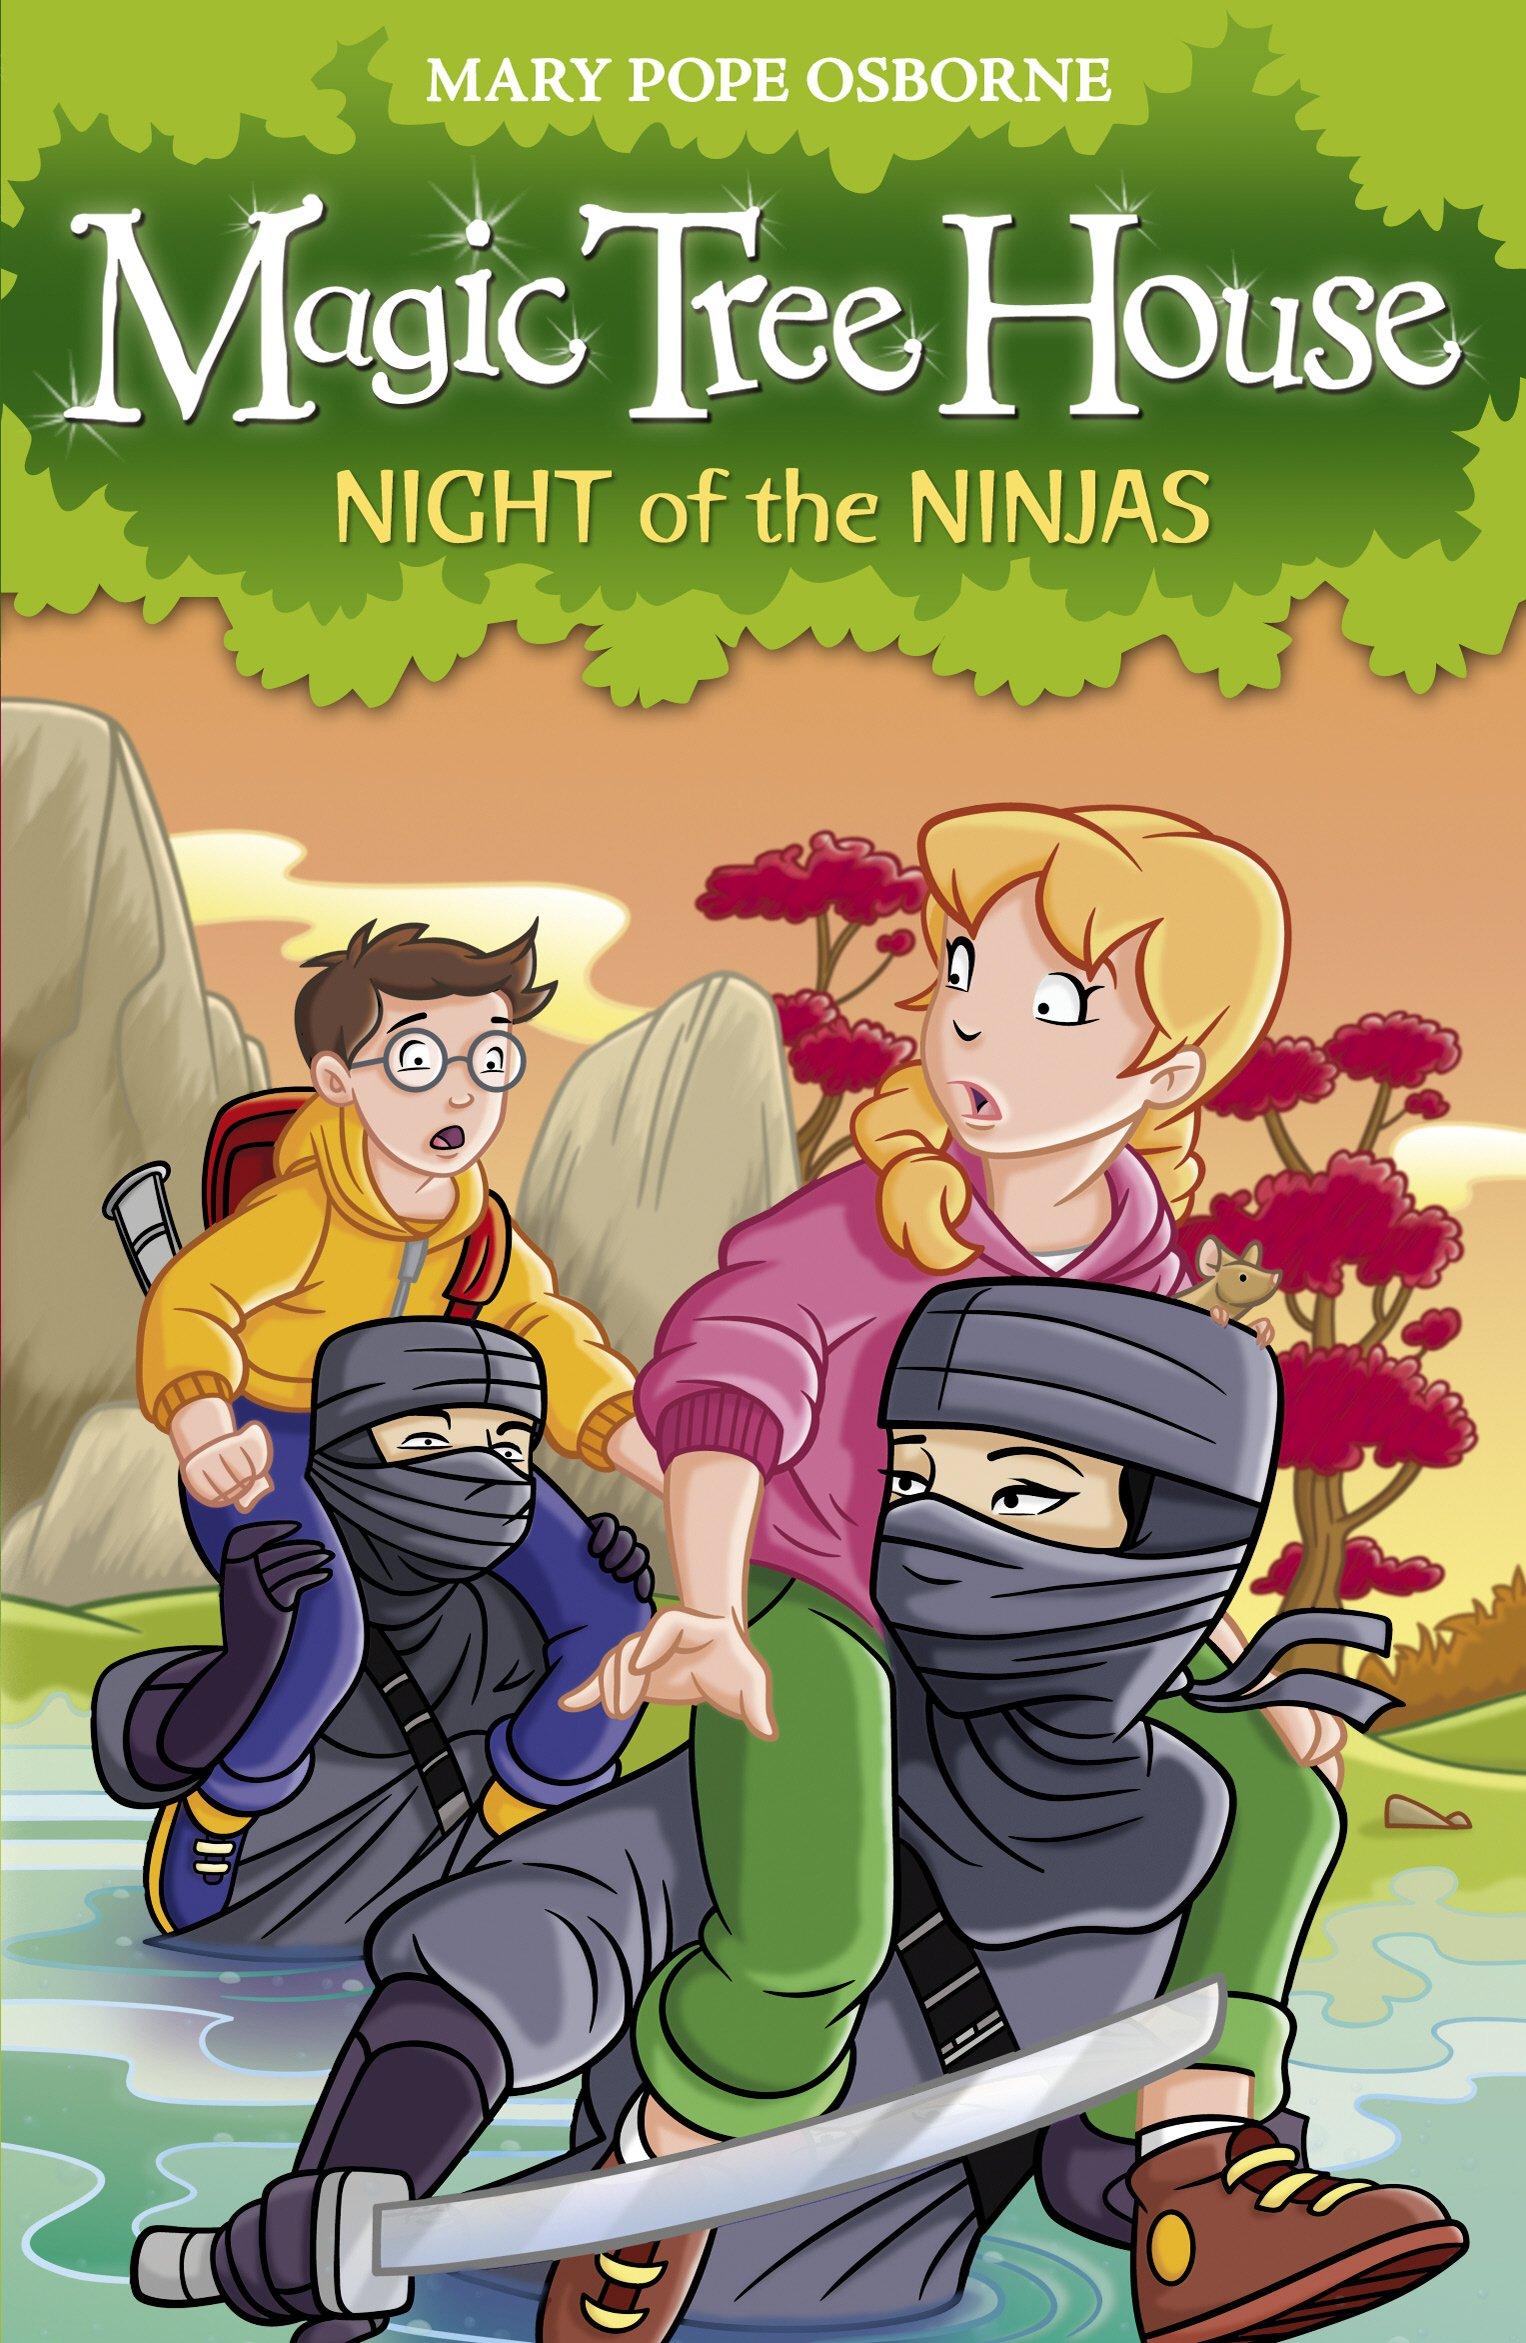 Magic Tree House 5: Night of the Ninja: Mary Pope Osborne ...